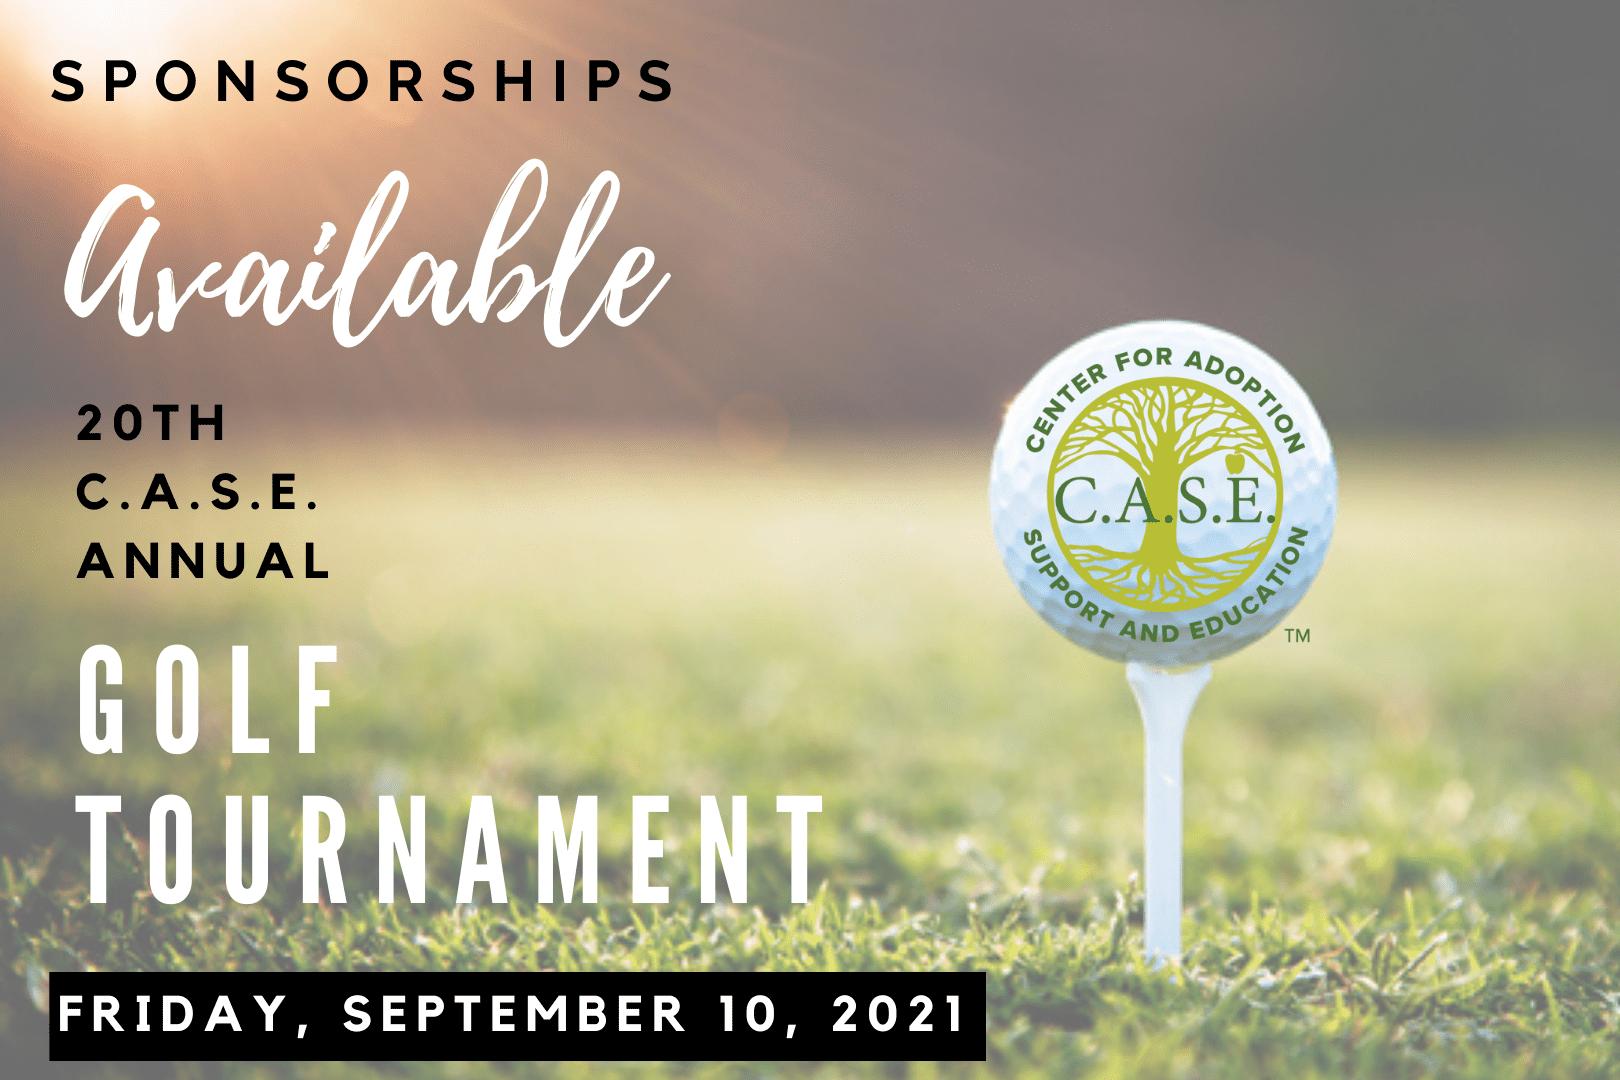 20th Annual C.A.S.E. Golf Tournament September 10th, 2021